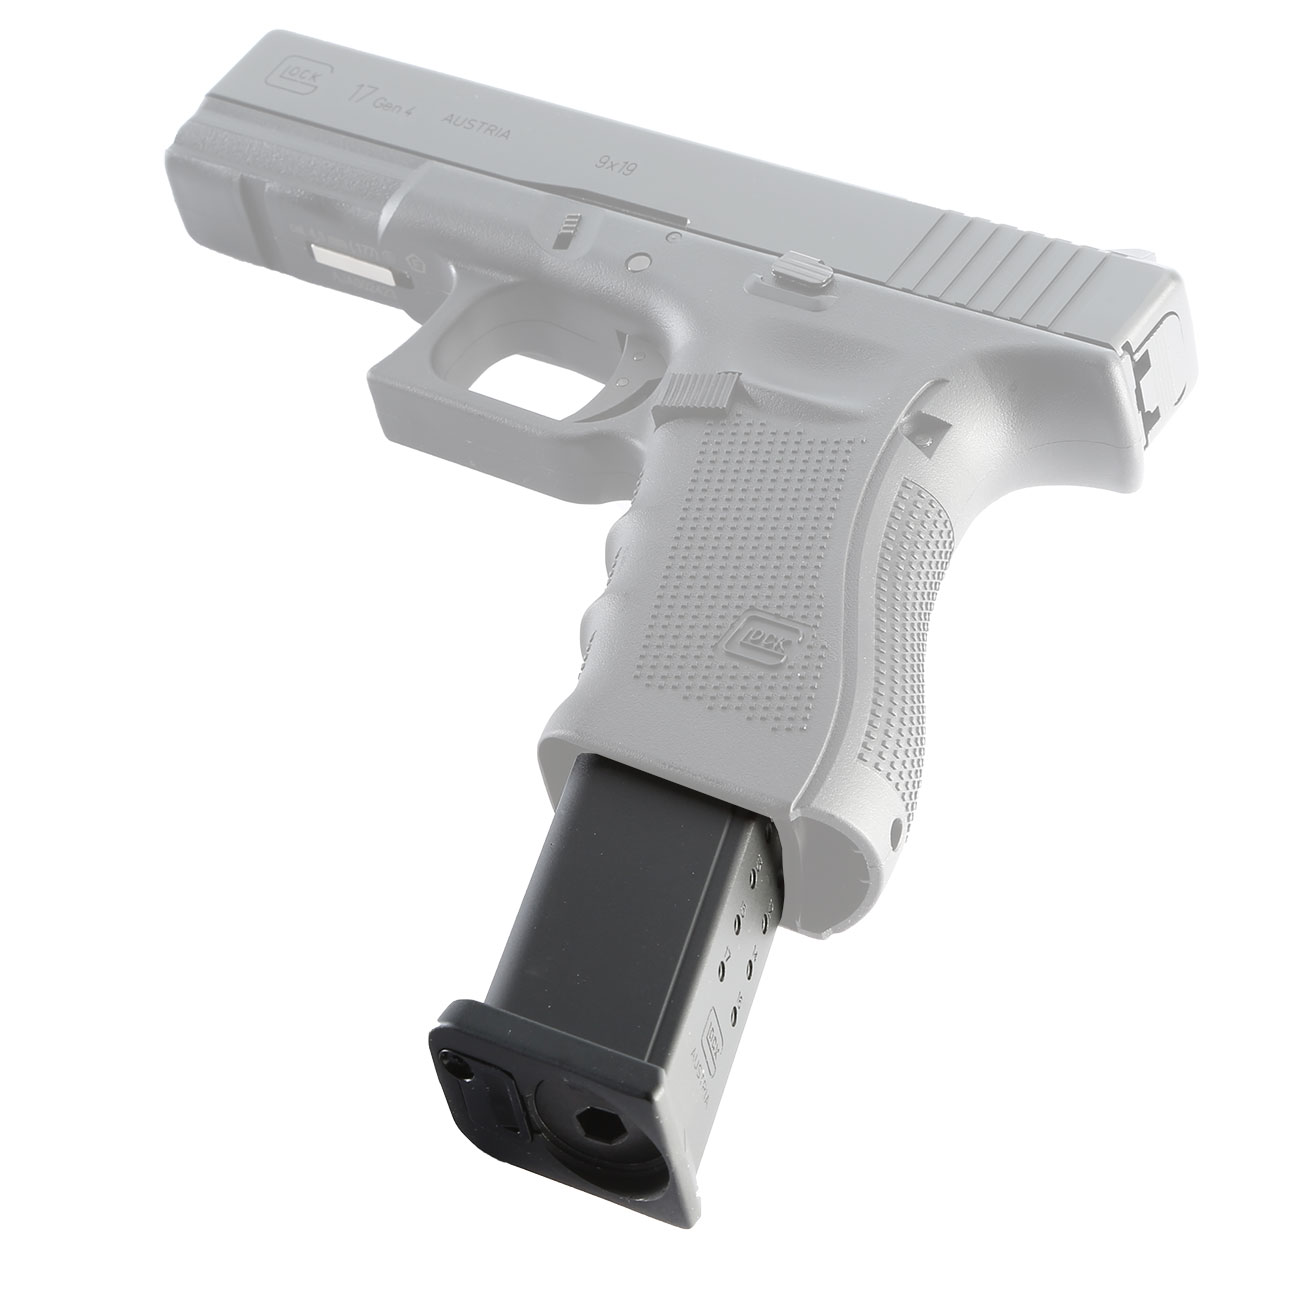 Luftpistole mit magazin